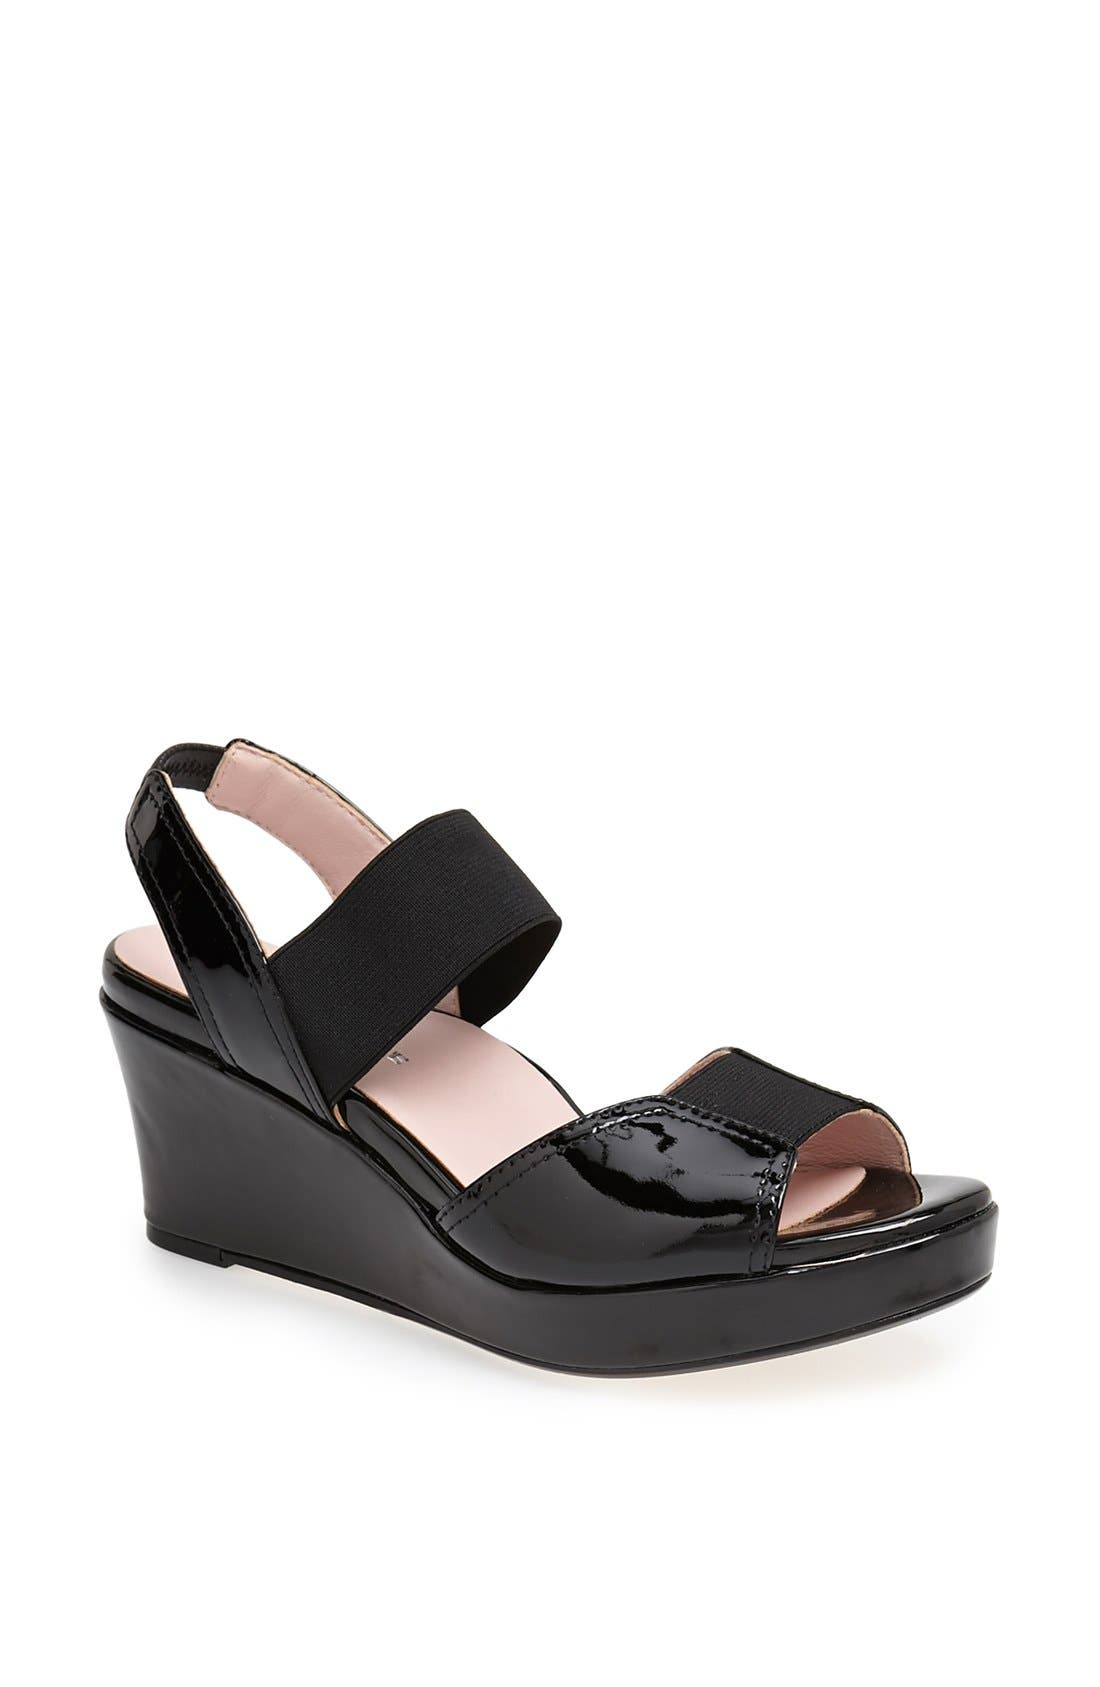 Main Image - Taryn Rose 'Sinai' Wedge Sandal